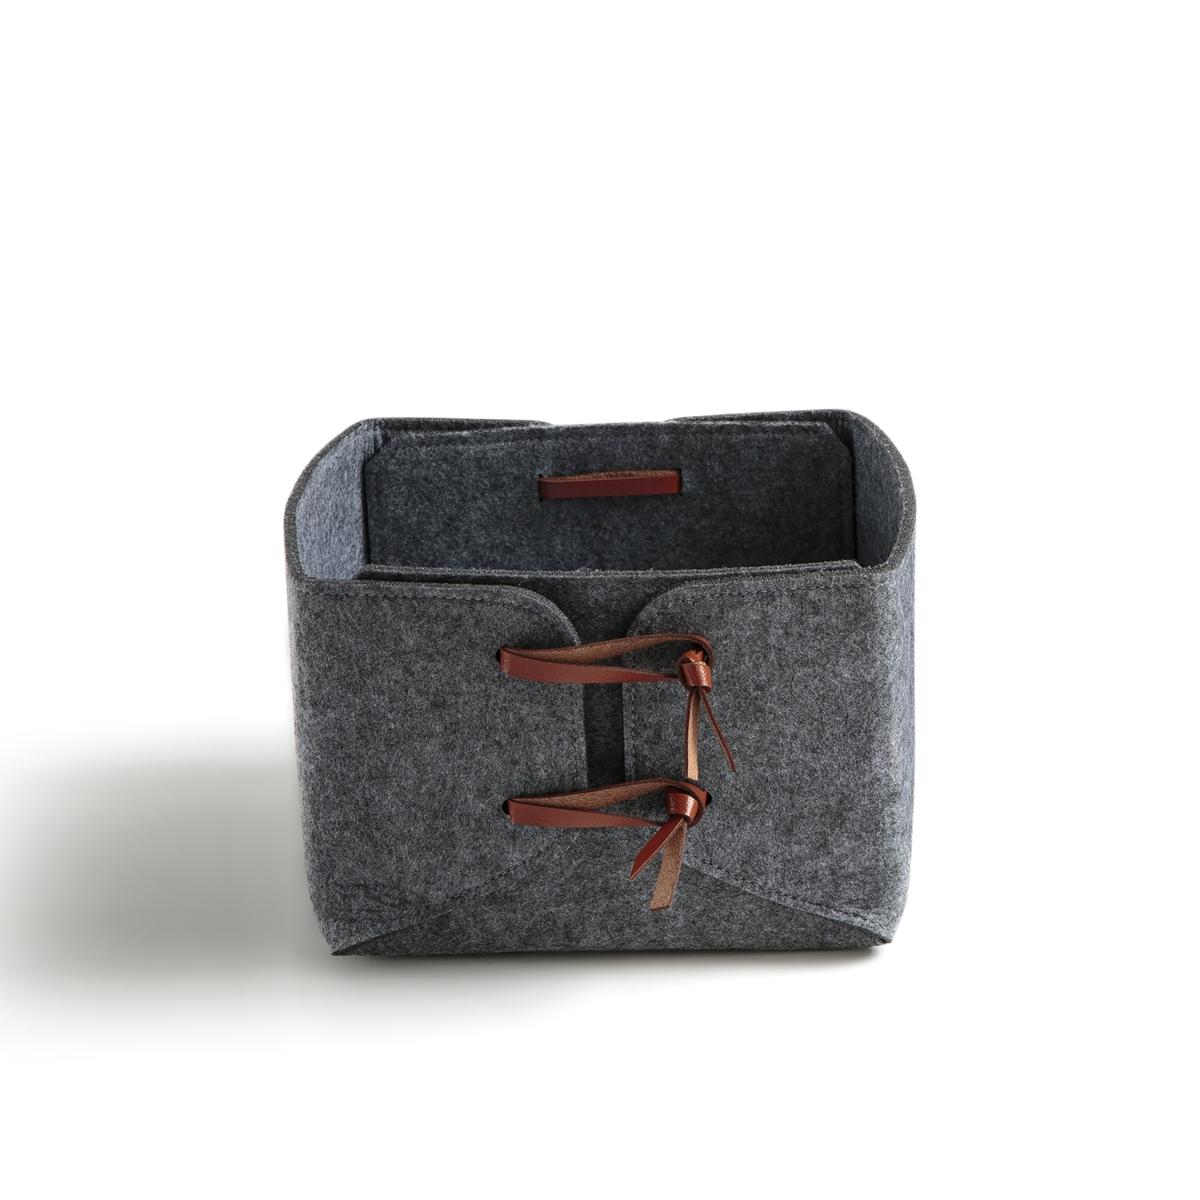 Коробка La Redoute Из фетрина Kyzac единый размер серый комплект из пиал из la redoute фаянса ajila единый размер серый